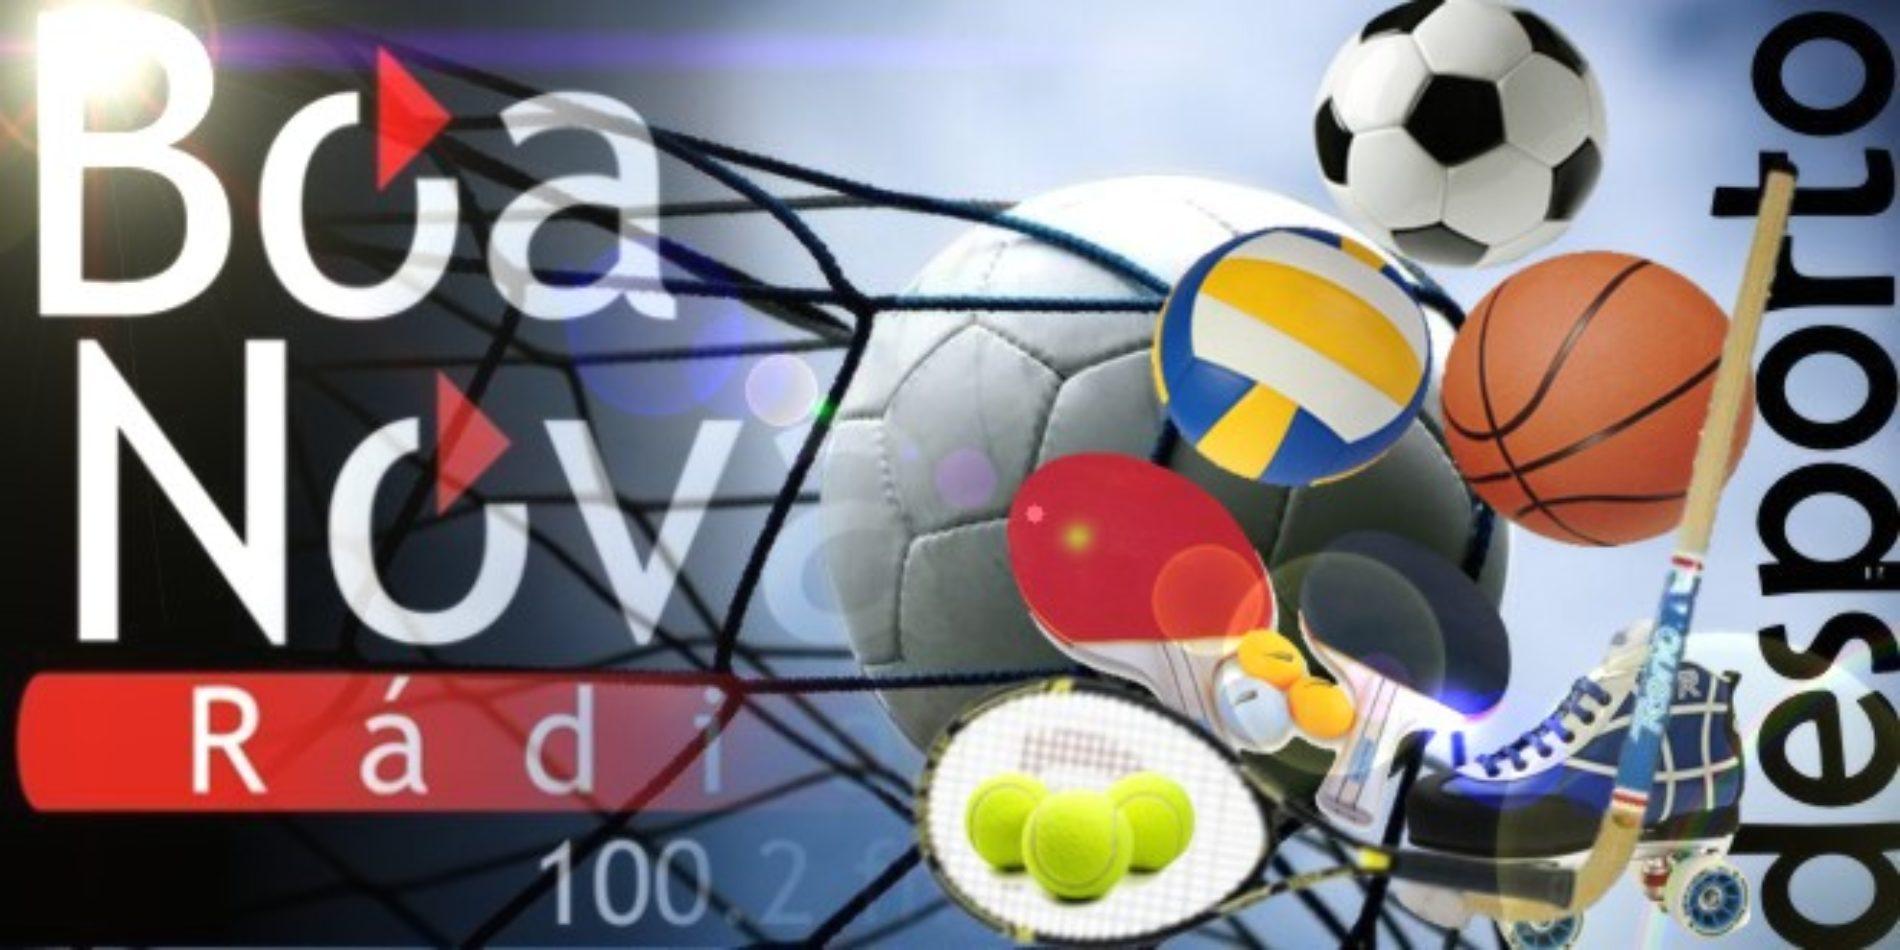 Desporto: FCOH e ADN empataram. AD Lagares e Sampaense perderam